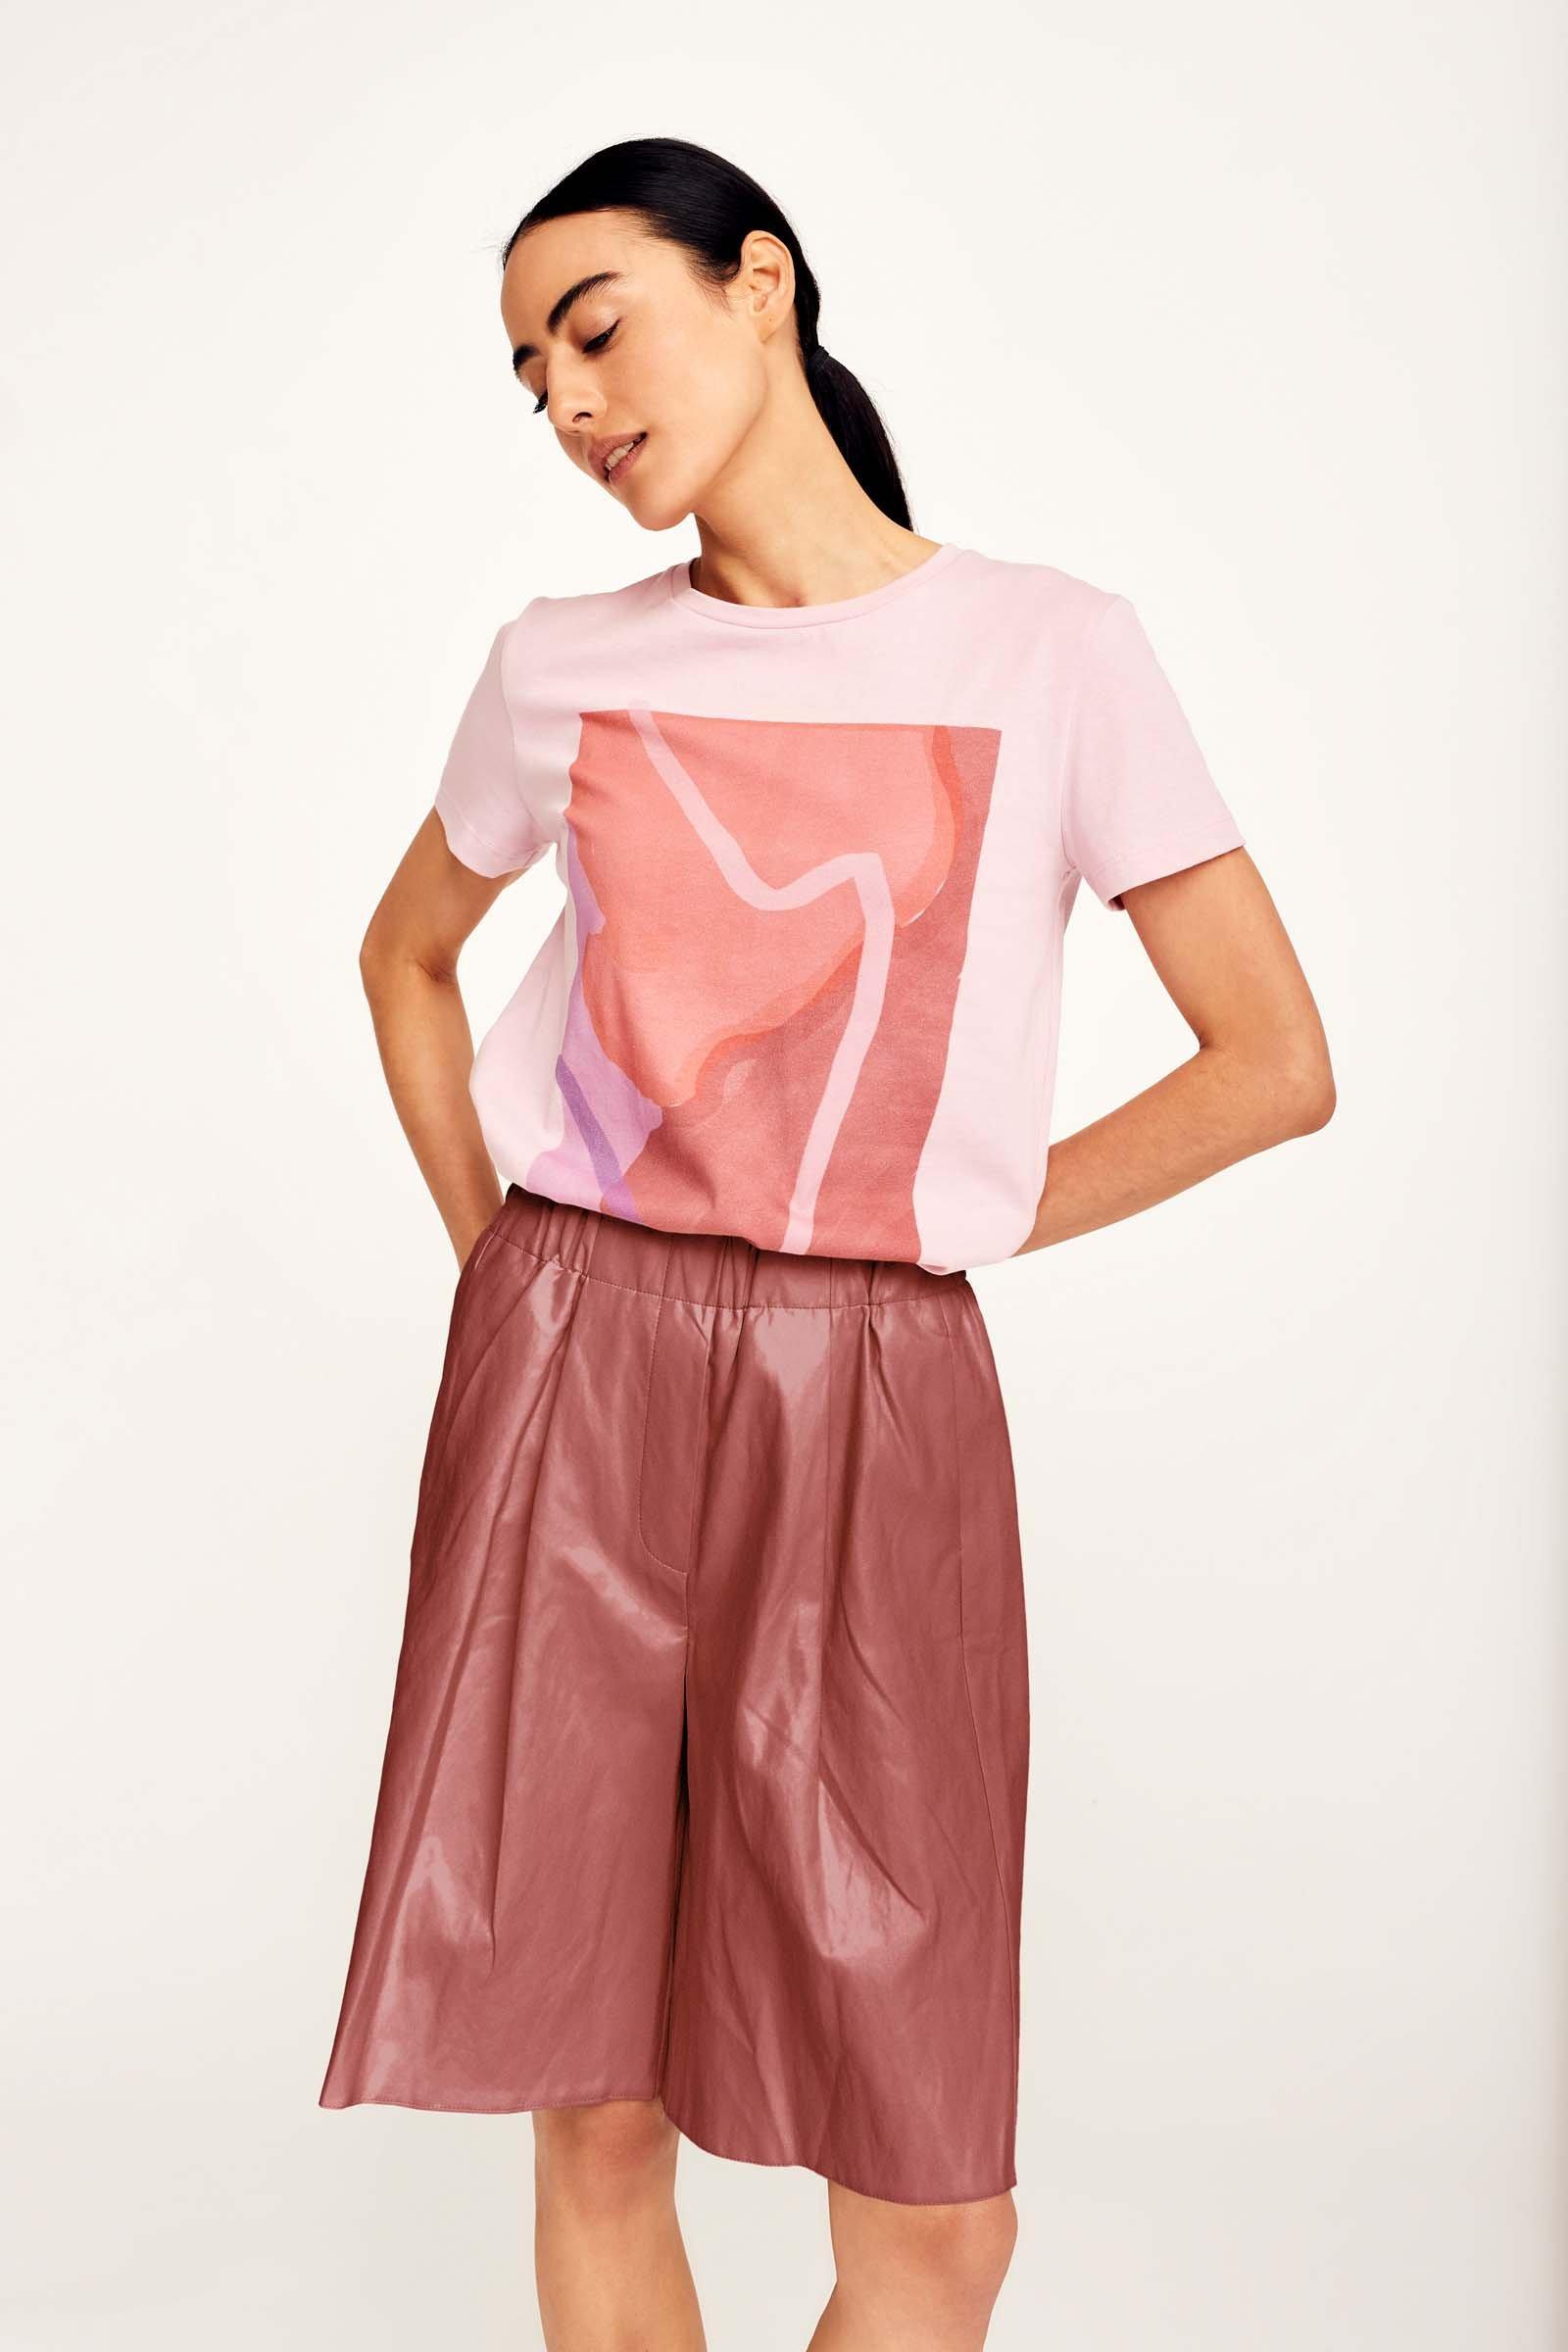 CKS Dames - LOUISE - t-shirt korte mouwen - roze